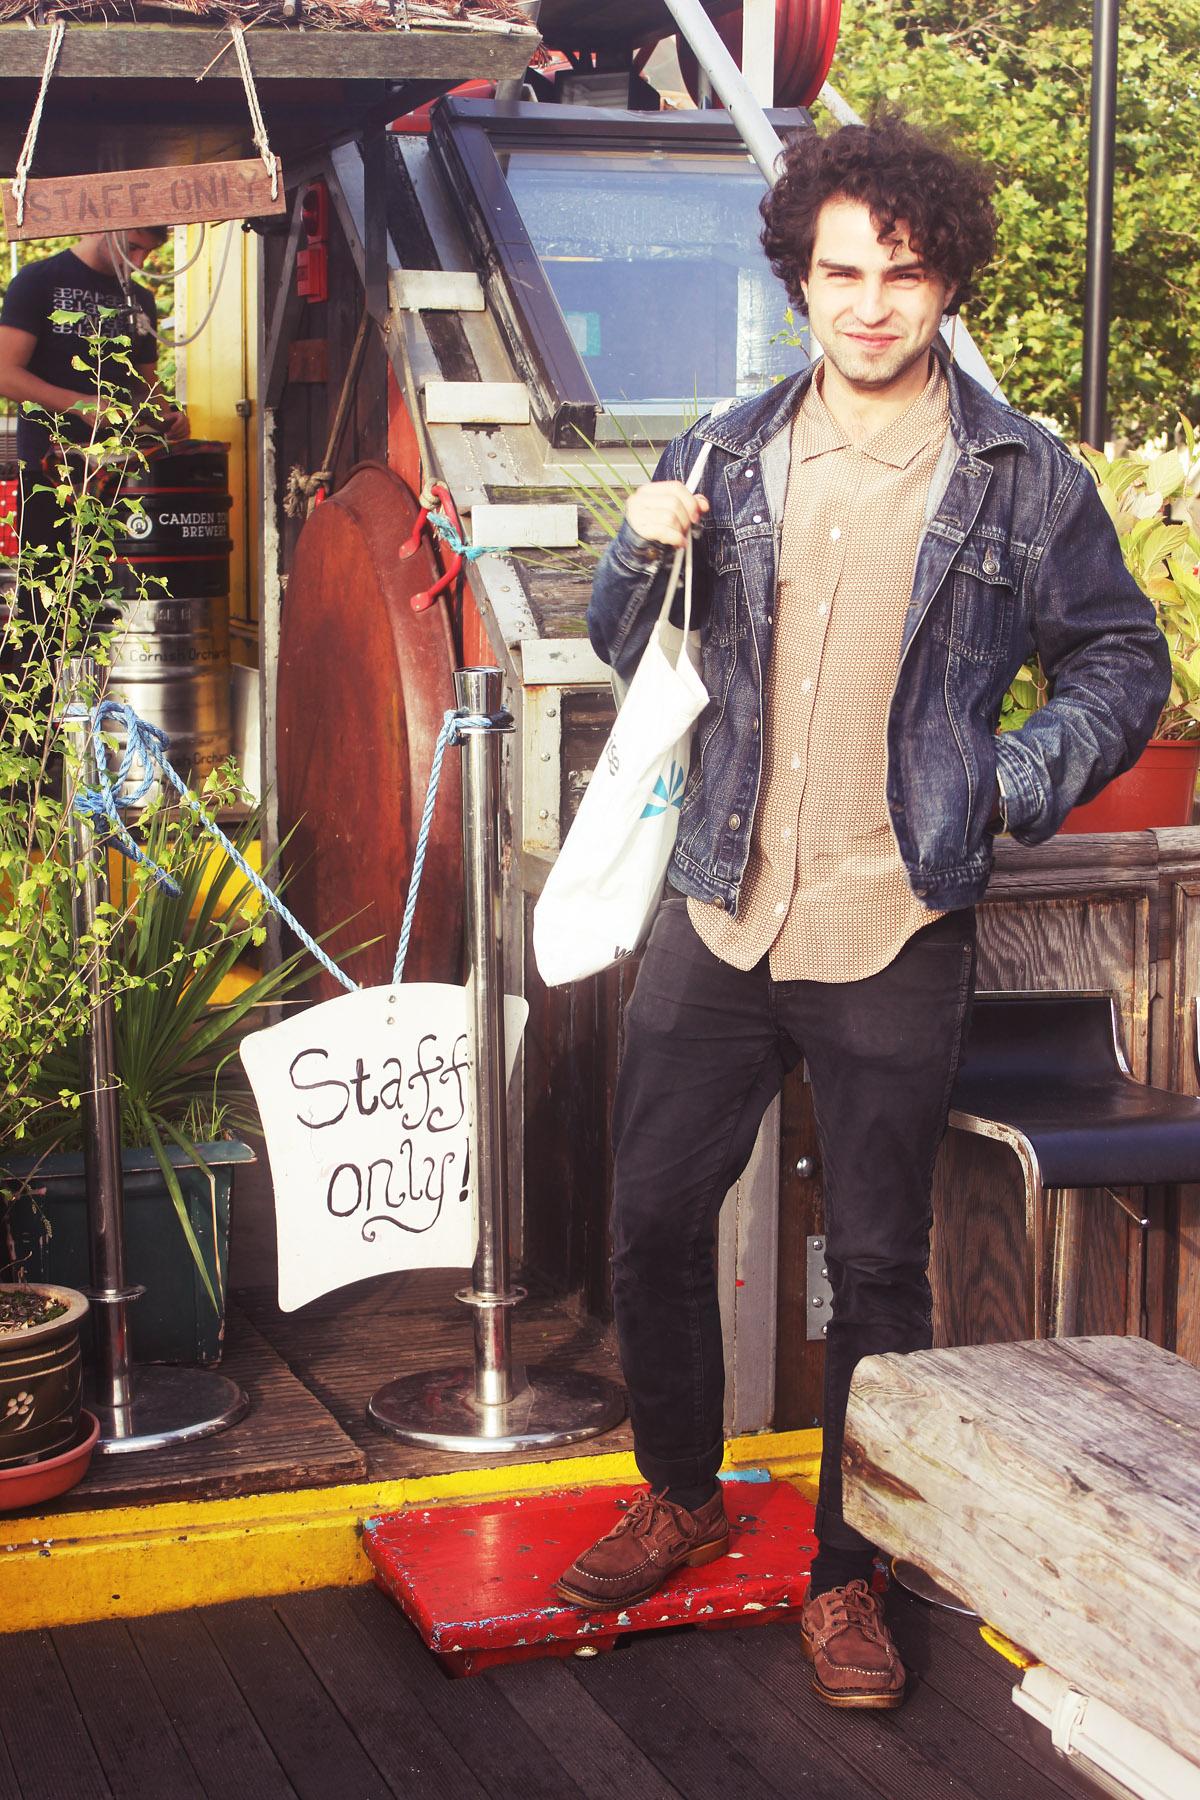 Danilo Tamesis boat dock boy vintage shirt denim jacket outside